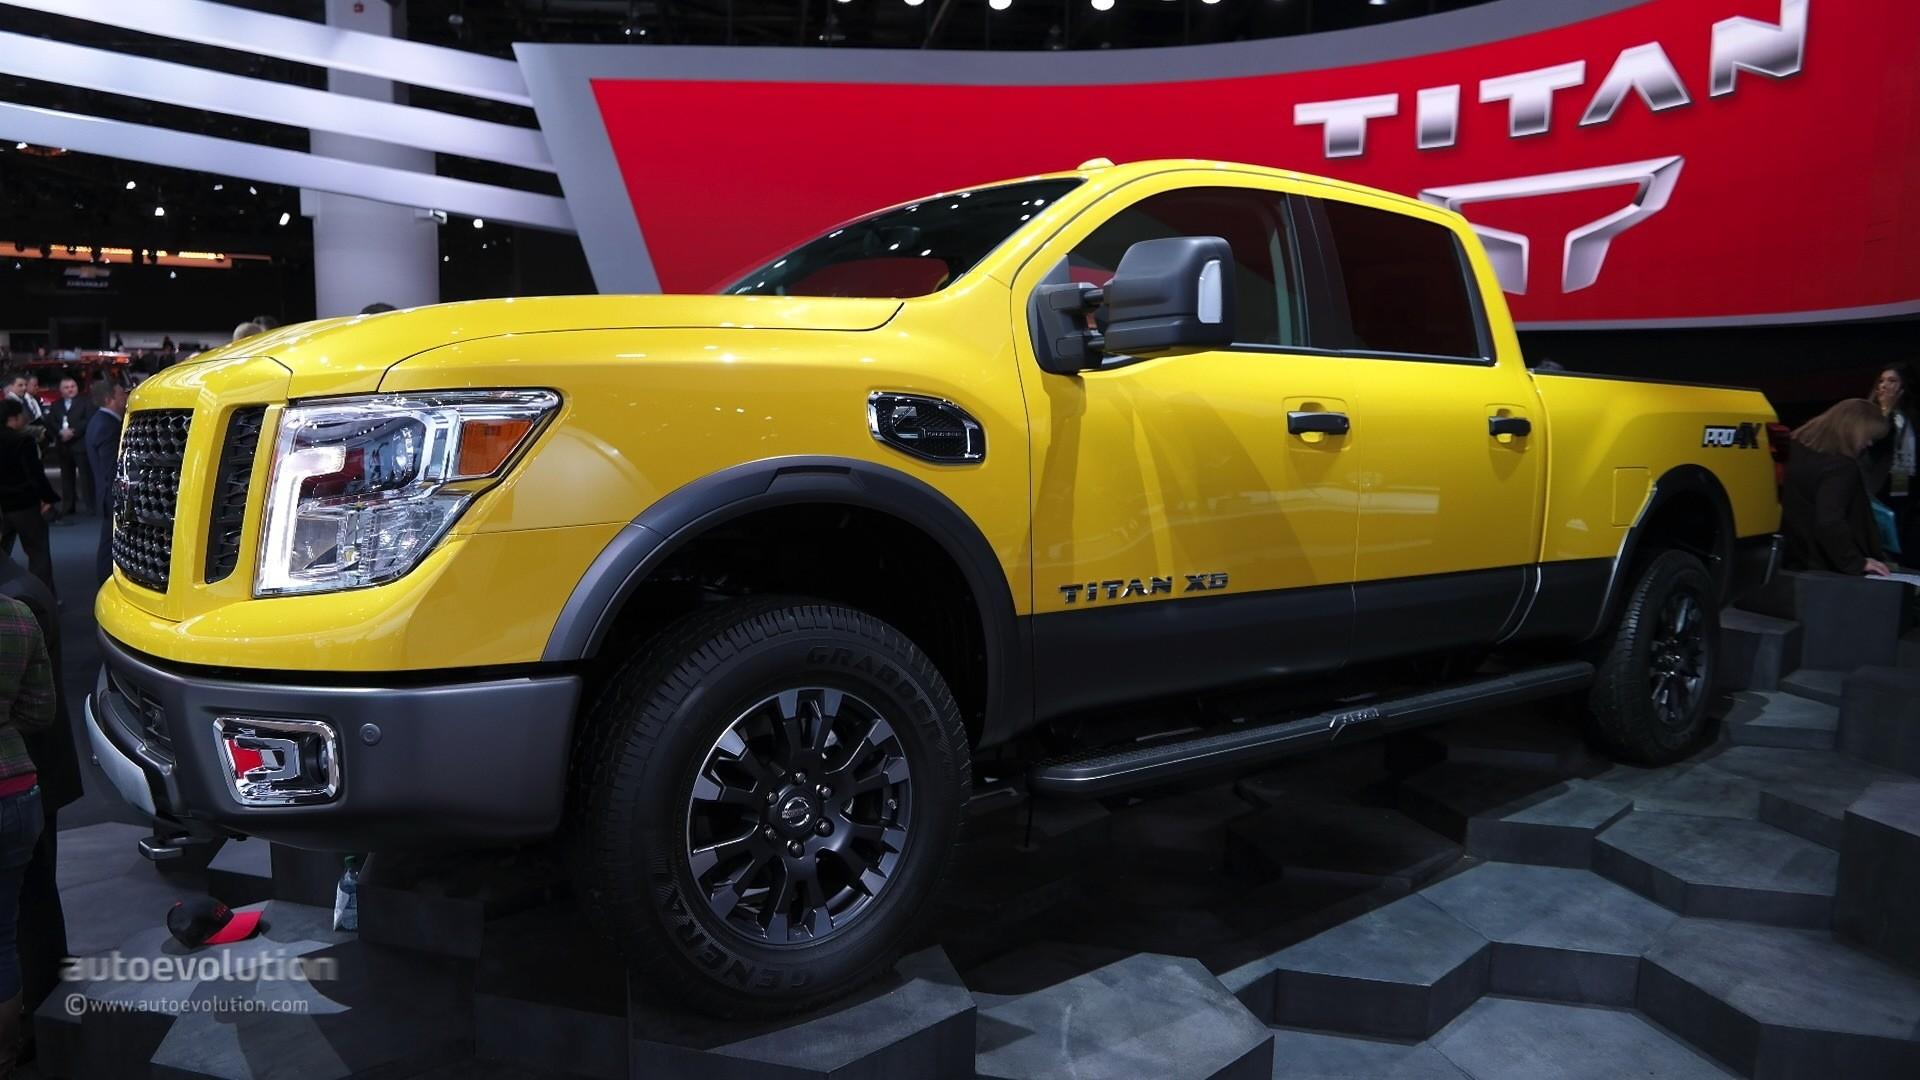 New 2016 Nissan Titan XD Cummins Light Duty Truck Has Heavy Duty Attitude     Nissan